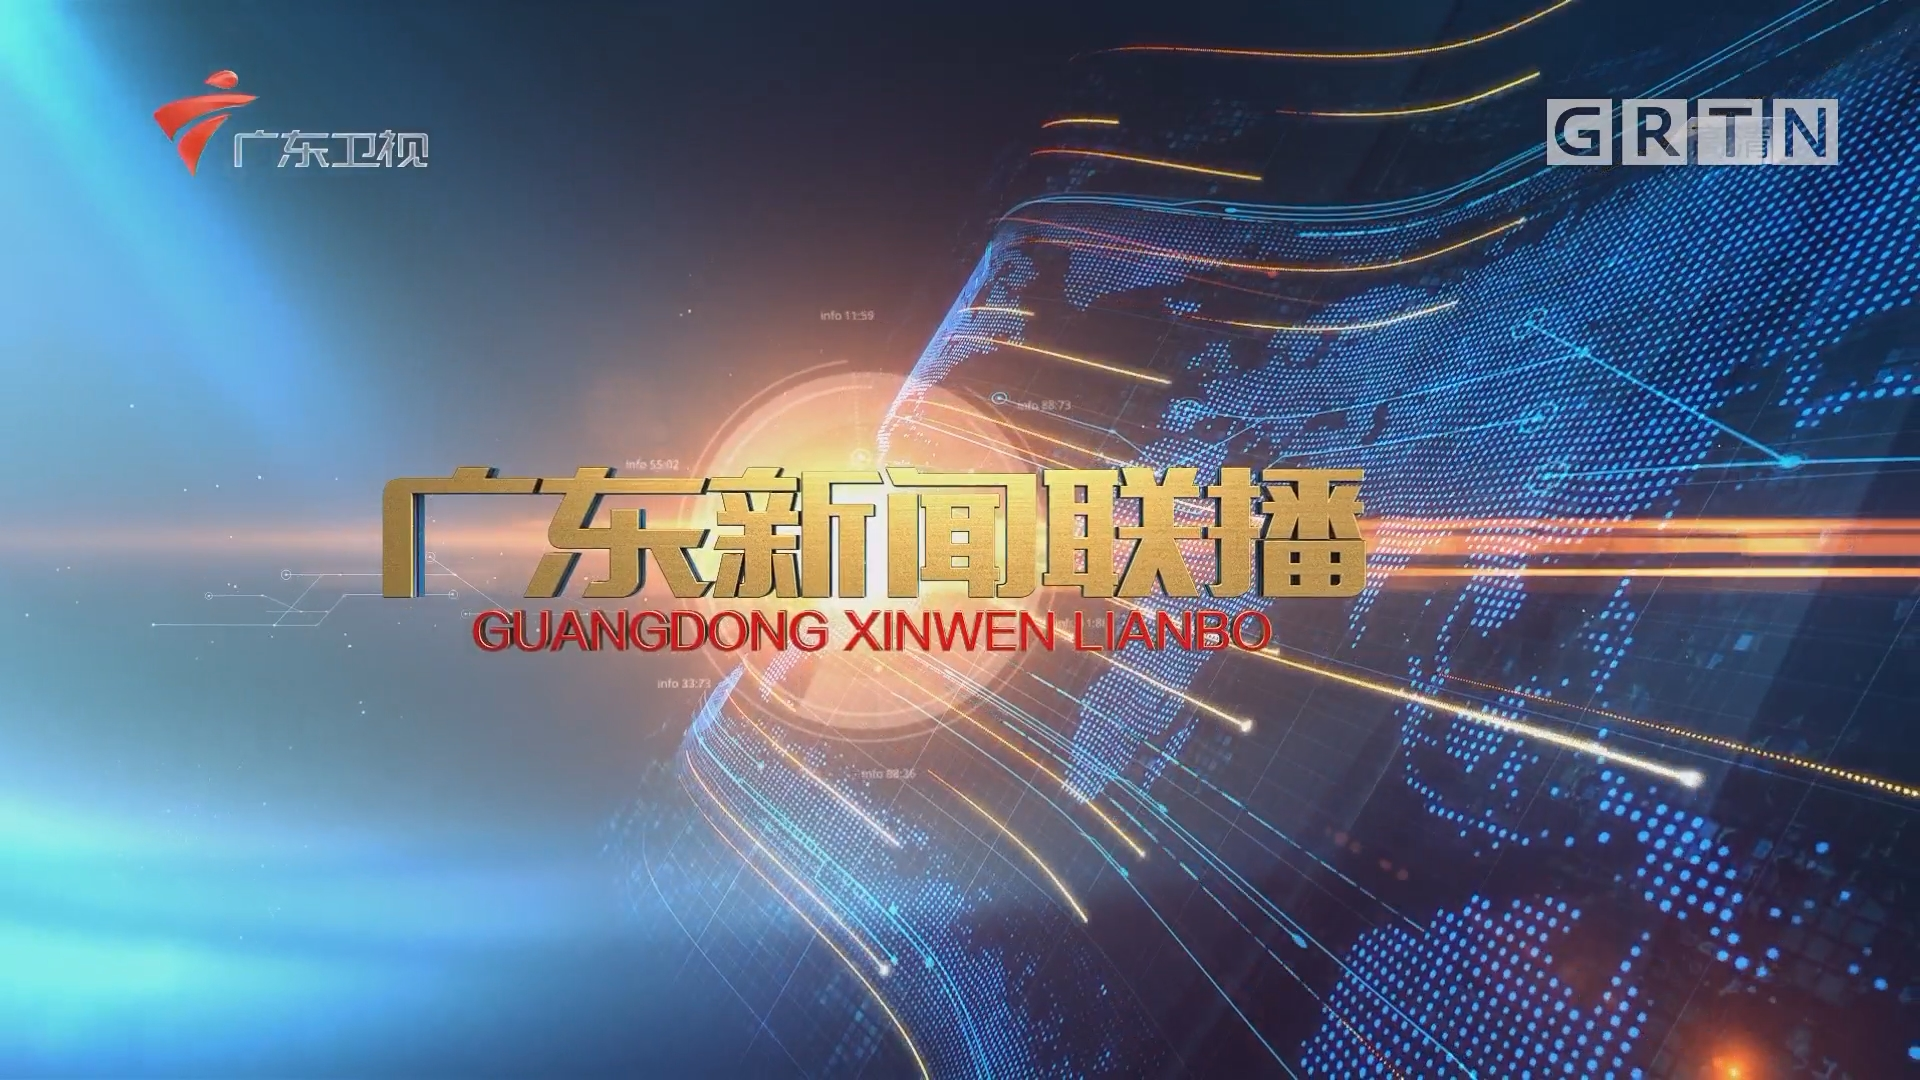 [HD][2018-12-02]广东新闻联播:中美就经贸问题达成共识 决定停止升级关税等贸易限制措施